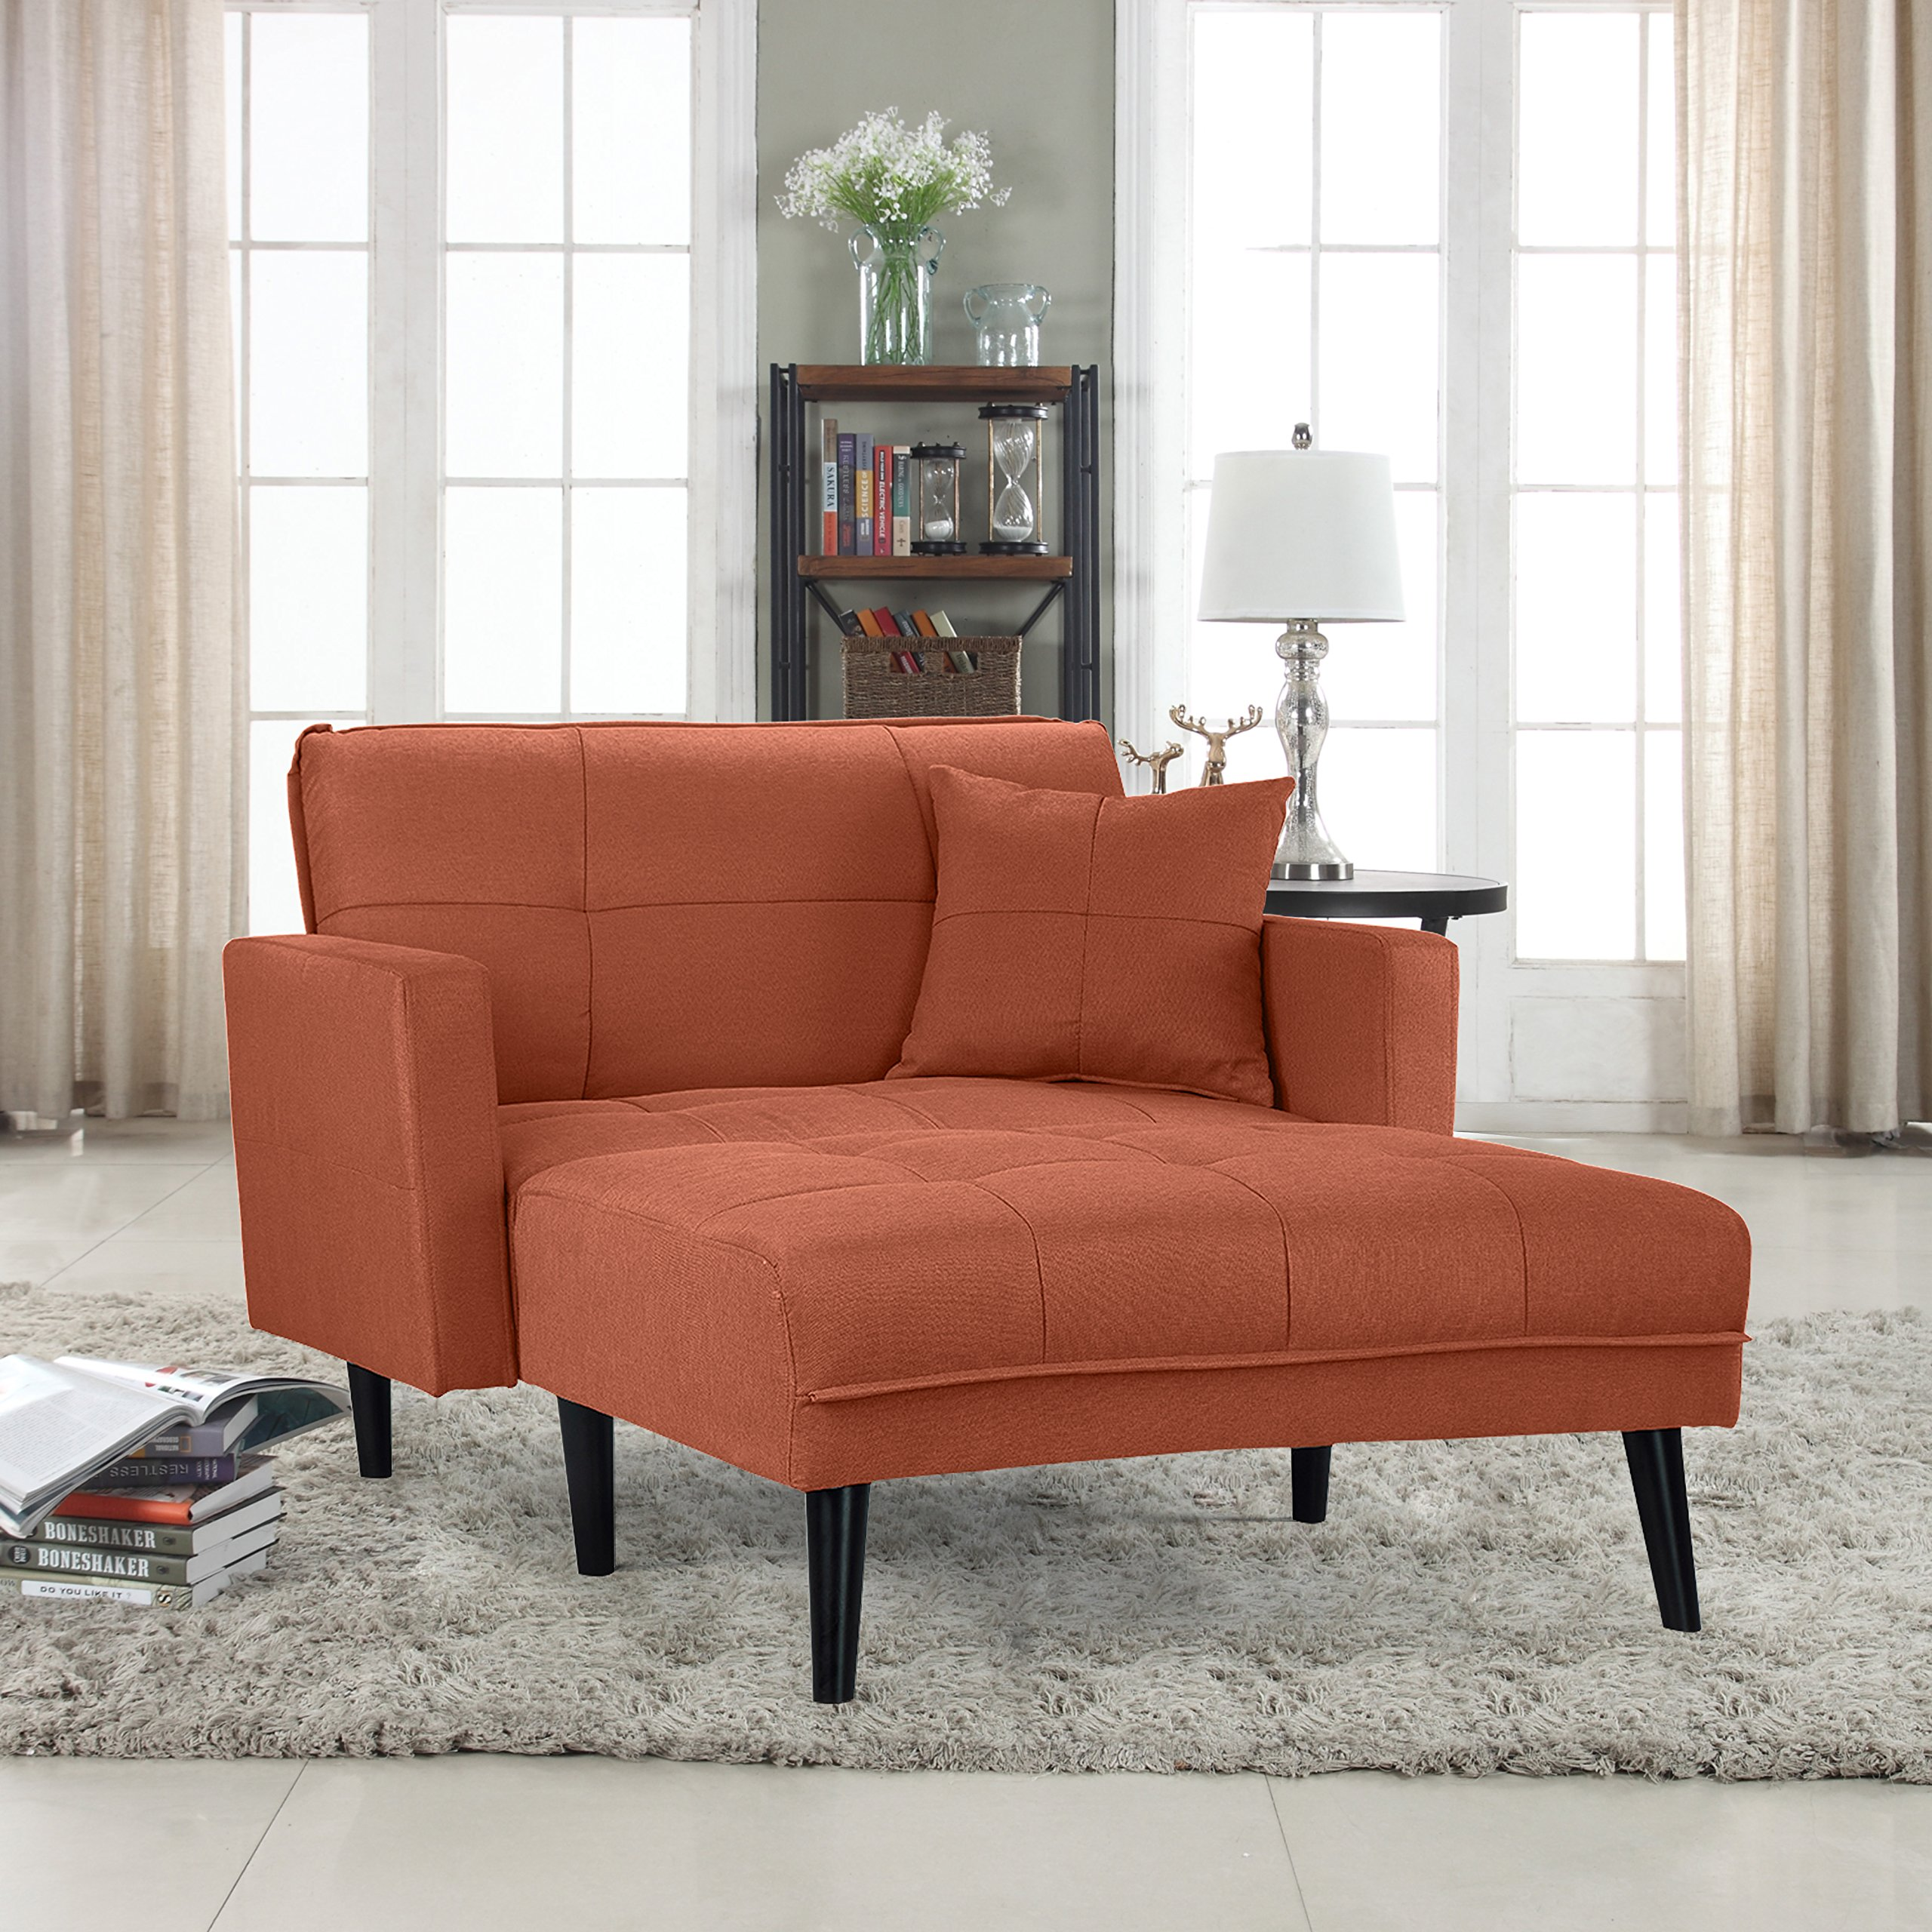 Get Quotations Divano Roma Furniture Modern Linen Fabric Recliner Futon Chaise Lounge Sleeper Single Seater